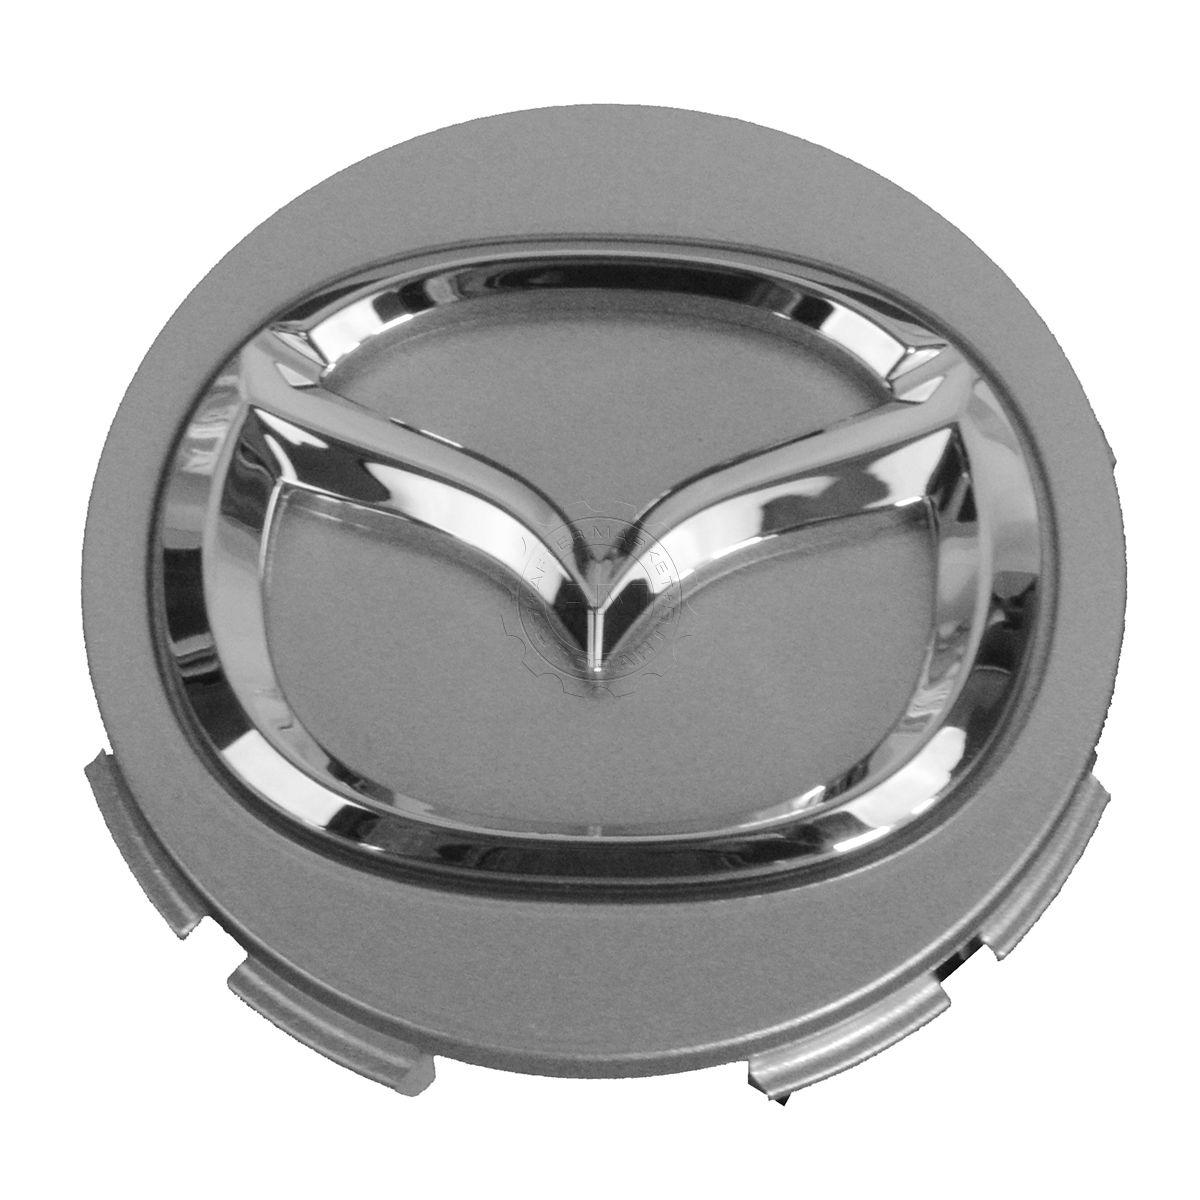 "New Oem 2004 2012 Mazda 5 6 Cx 7 Mpv Mx 5 Miata Left Fog: OEM G22C-37-190A Wheel Rim Center Cap Chrome ""Mazda"" Logo"